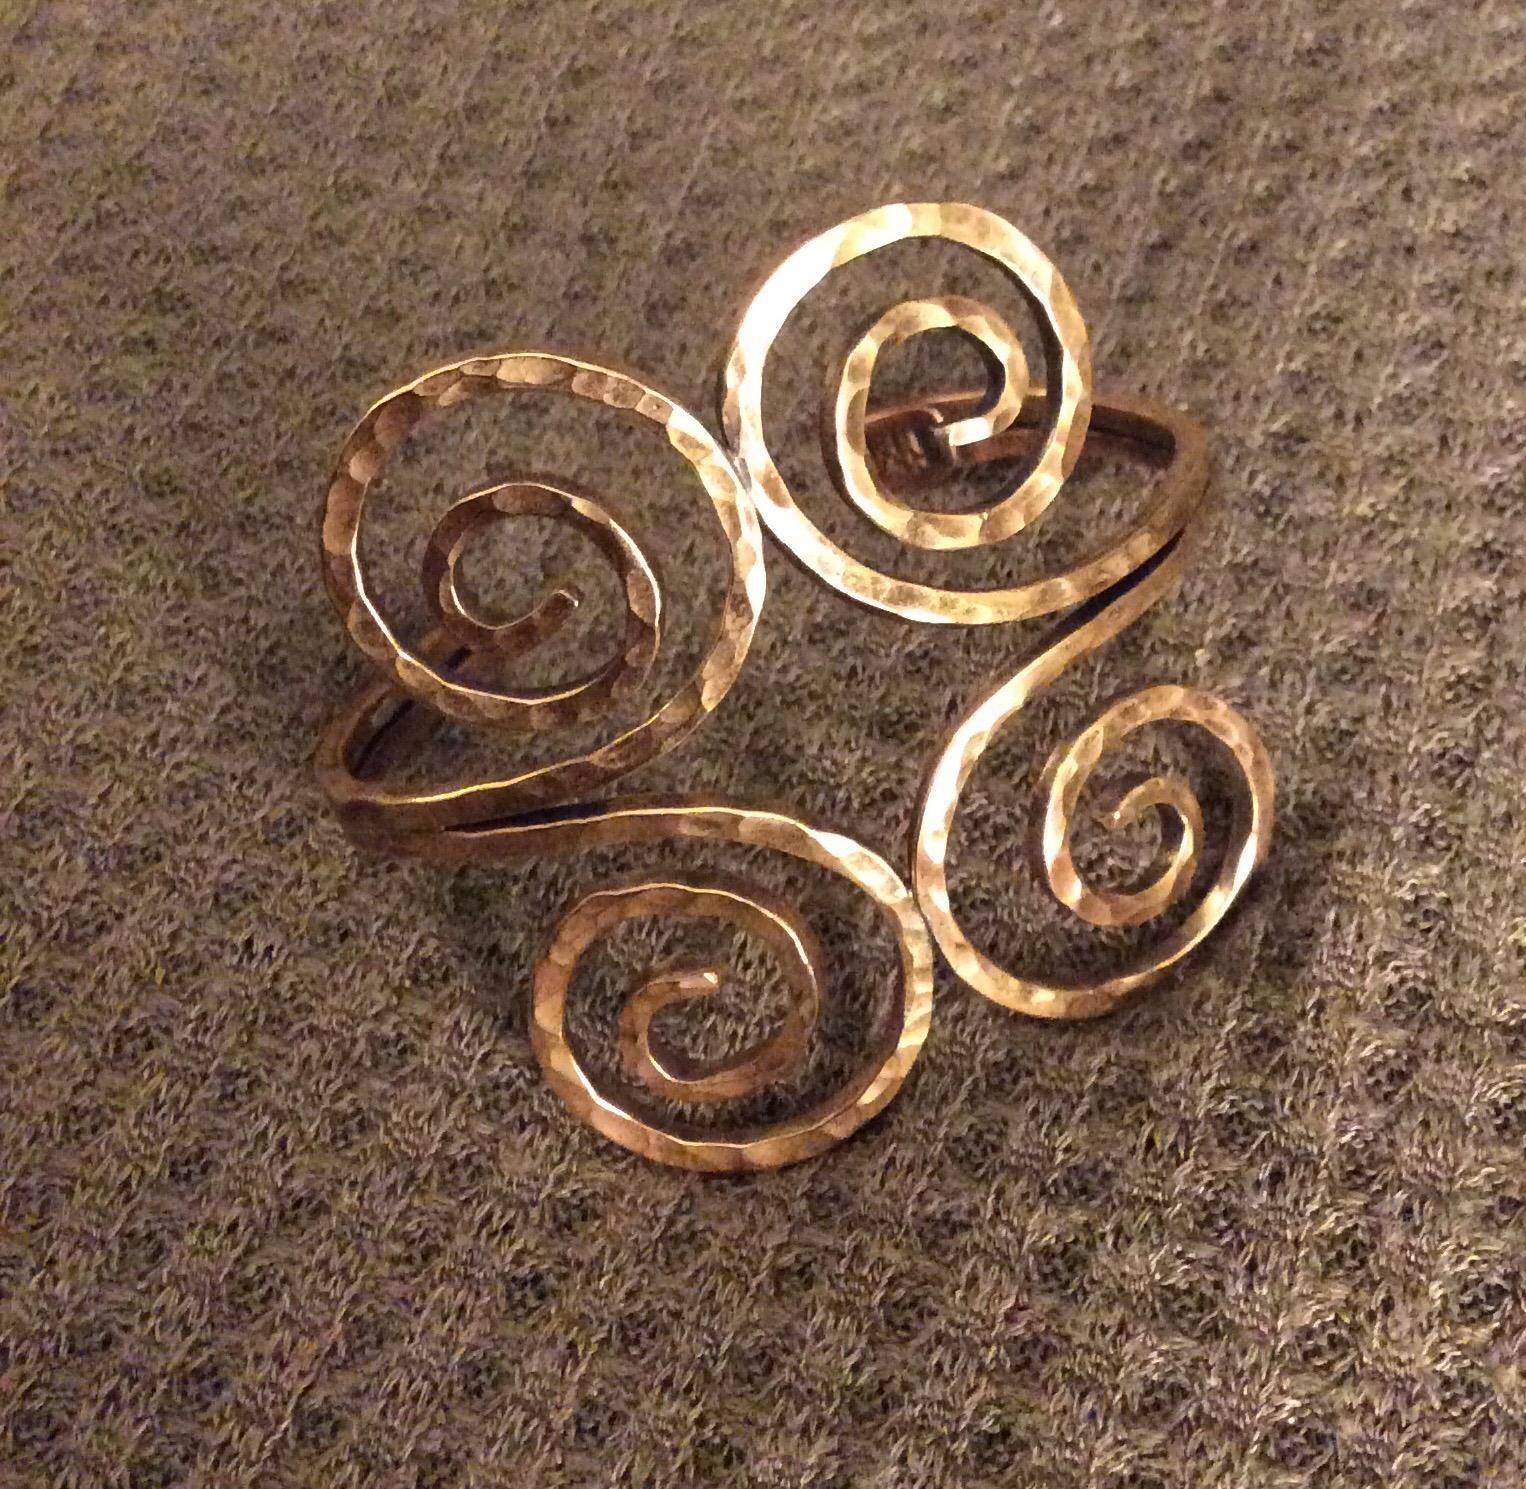 Christine Mundy • Spiral Bracelet • Bronze • 2.5 x 3.5 x 2.5 Inches • Bracelet forged from bronze wire • 2018